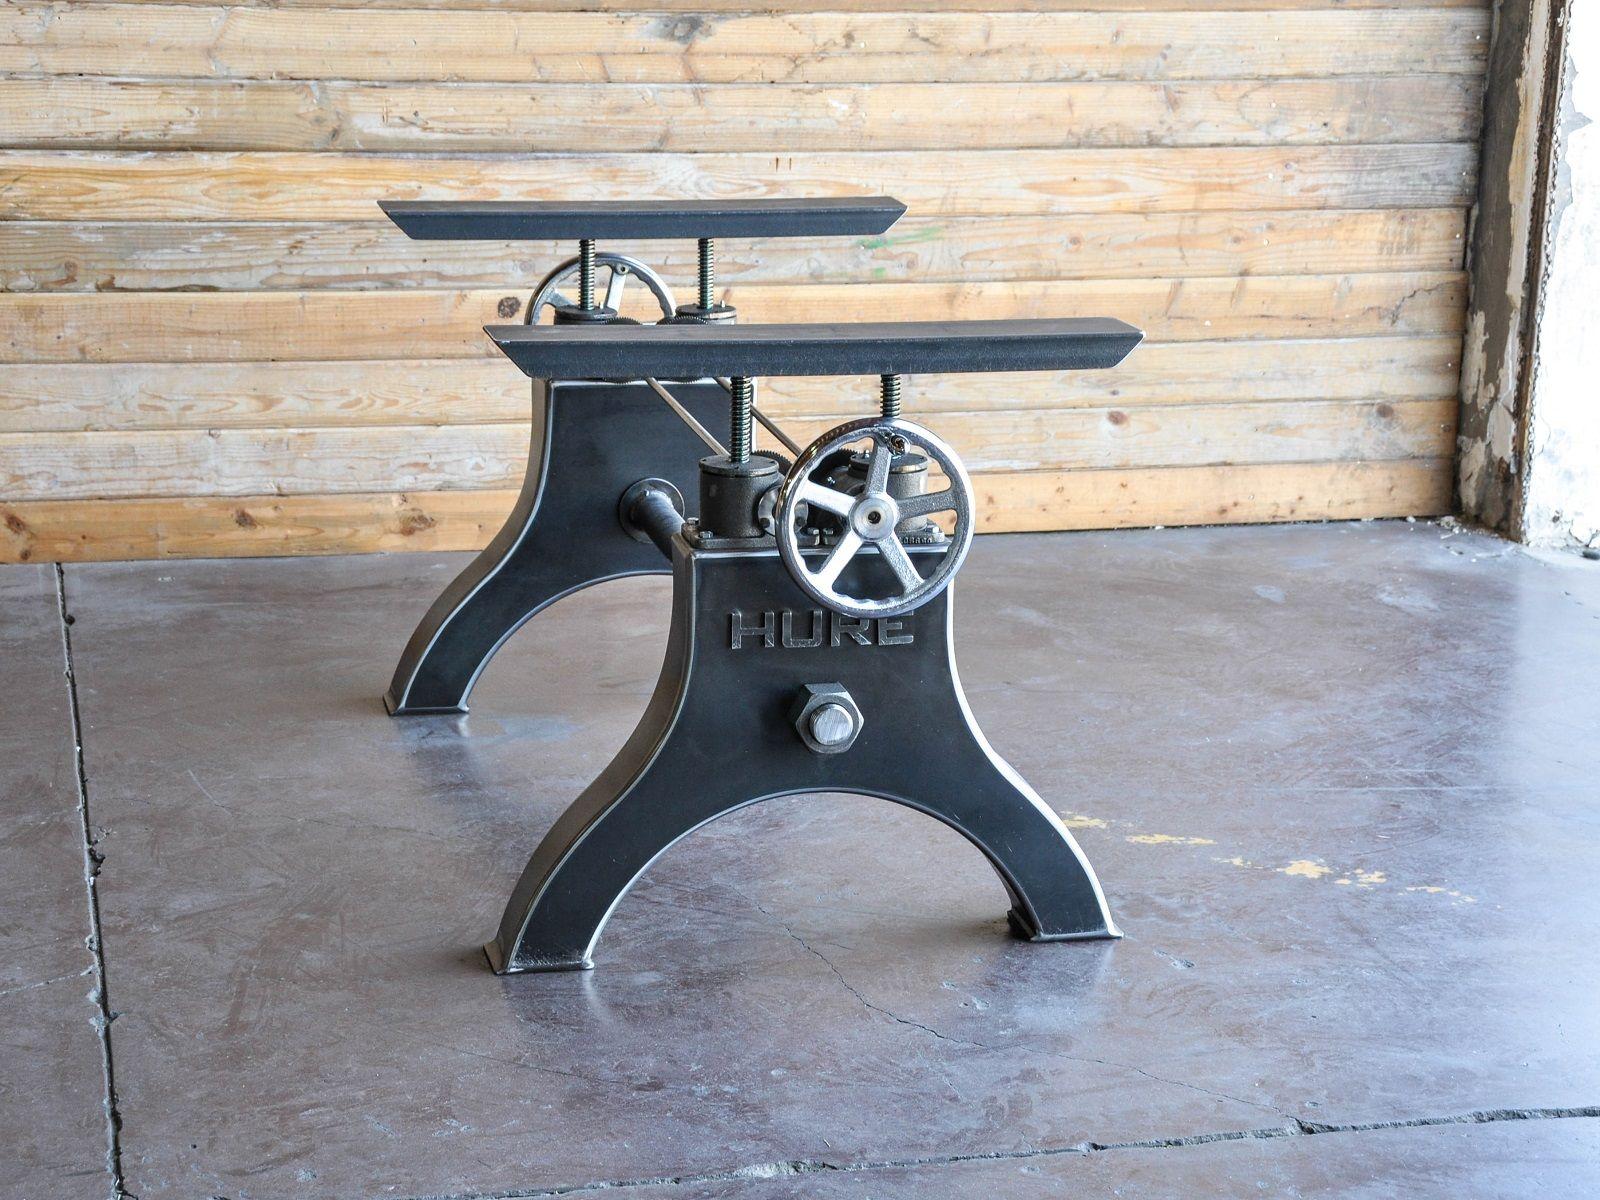 Hure Crank Table Base | Vintage Industrial Furniture